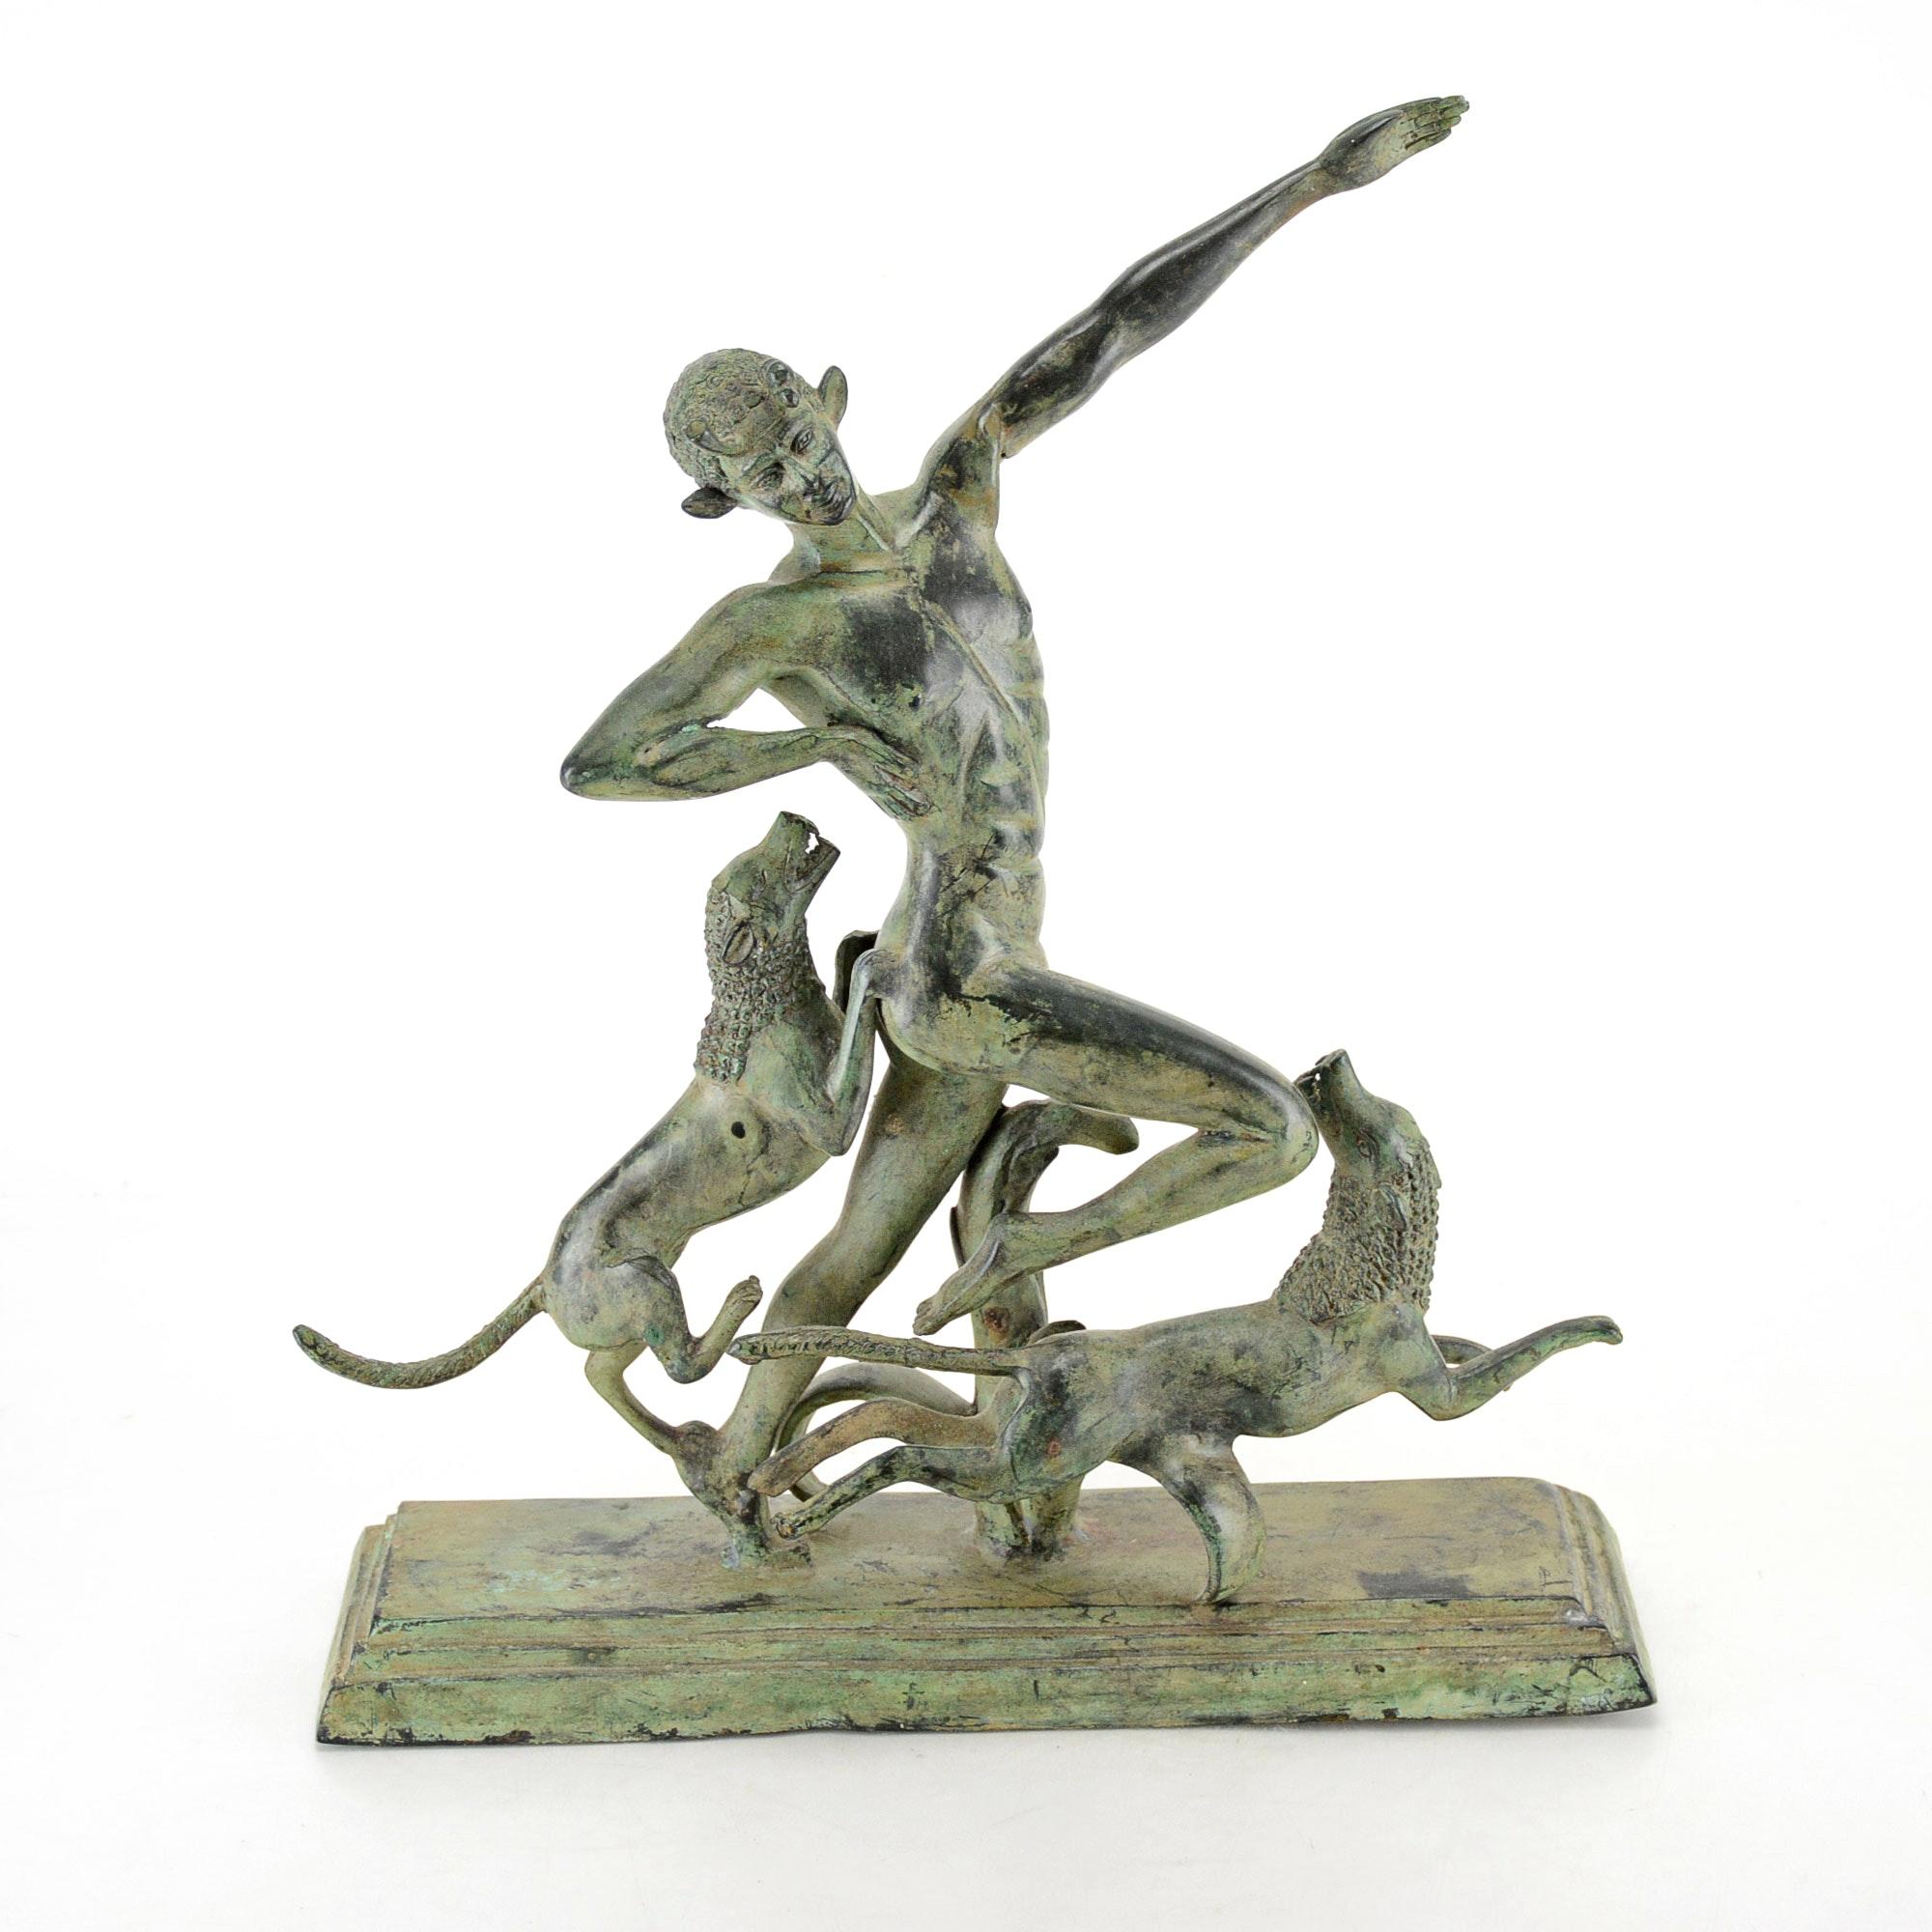 Composite Metal Sculpture of Actaeon